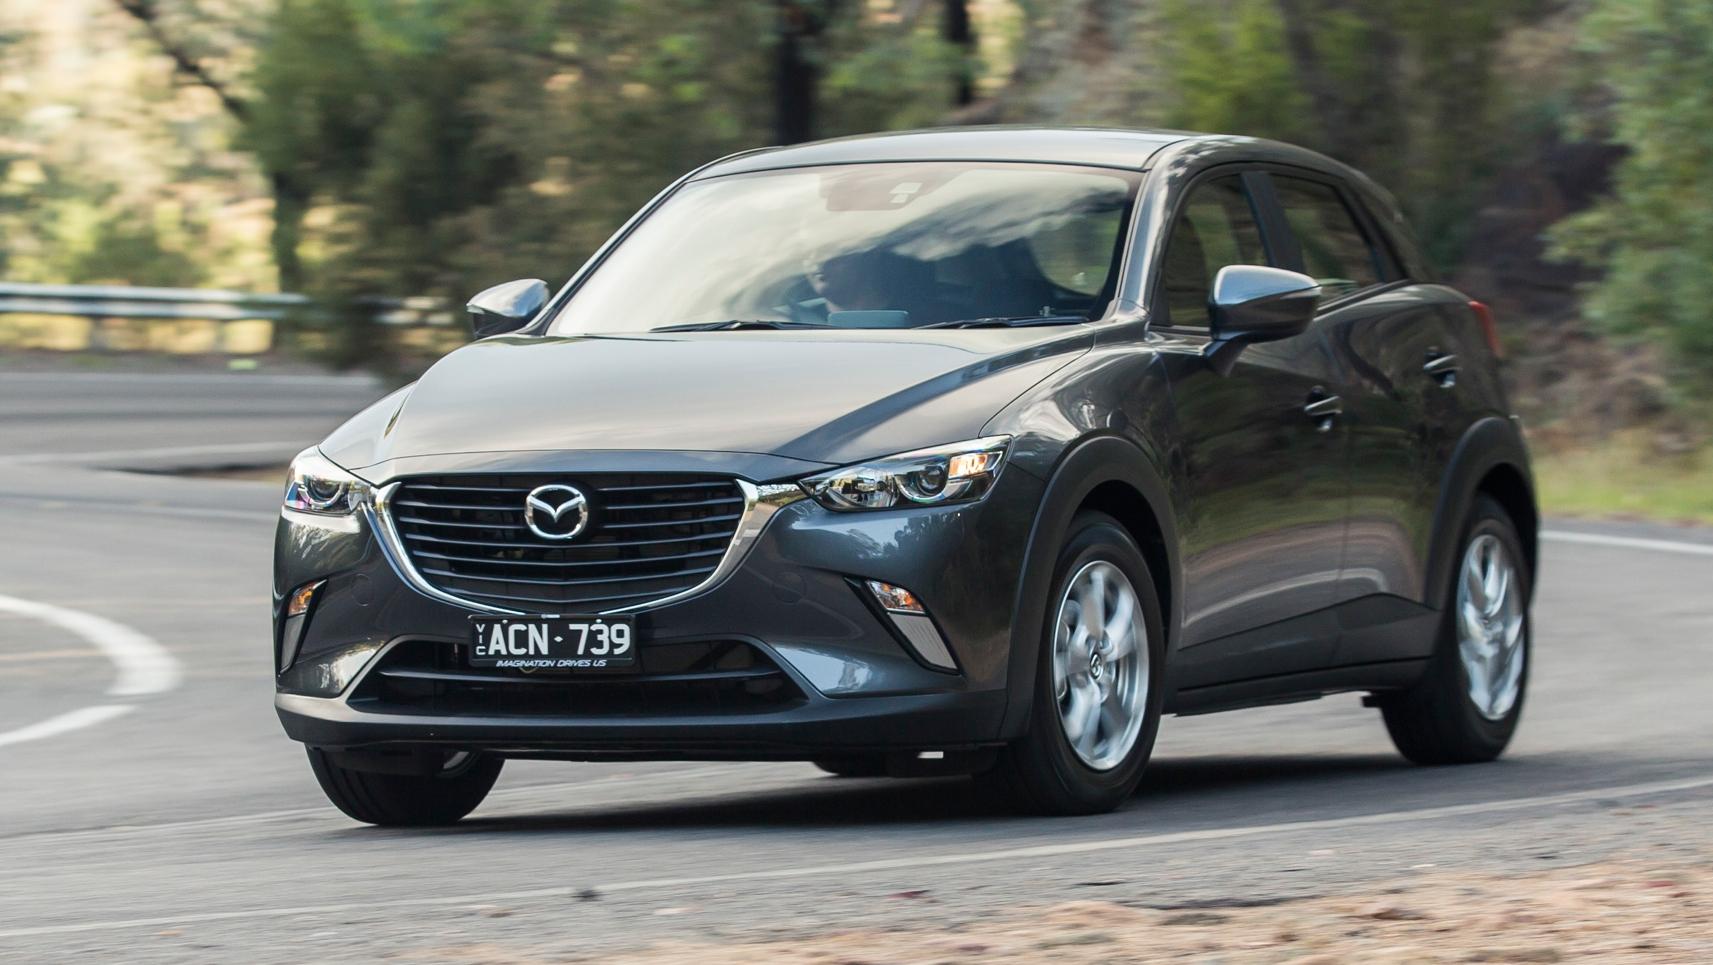 Mazda Cx 3 2020 New Car Reviews Models Onstar 2013 Chevy Wiring Diagram Gallery Australia Gets Four Grades